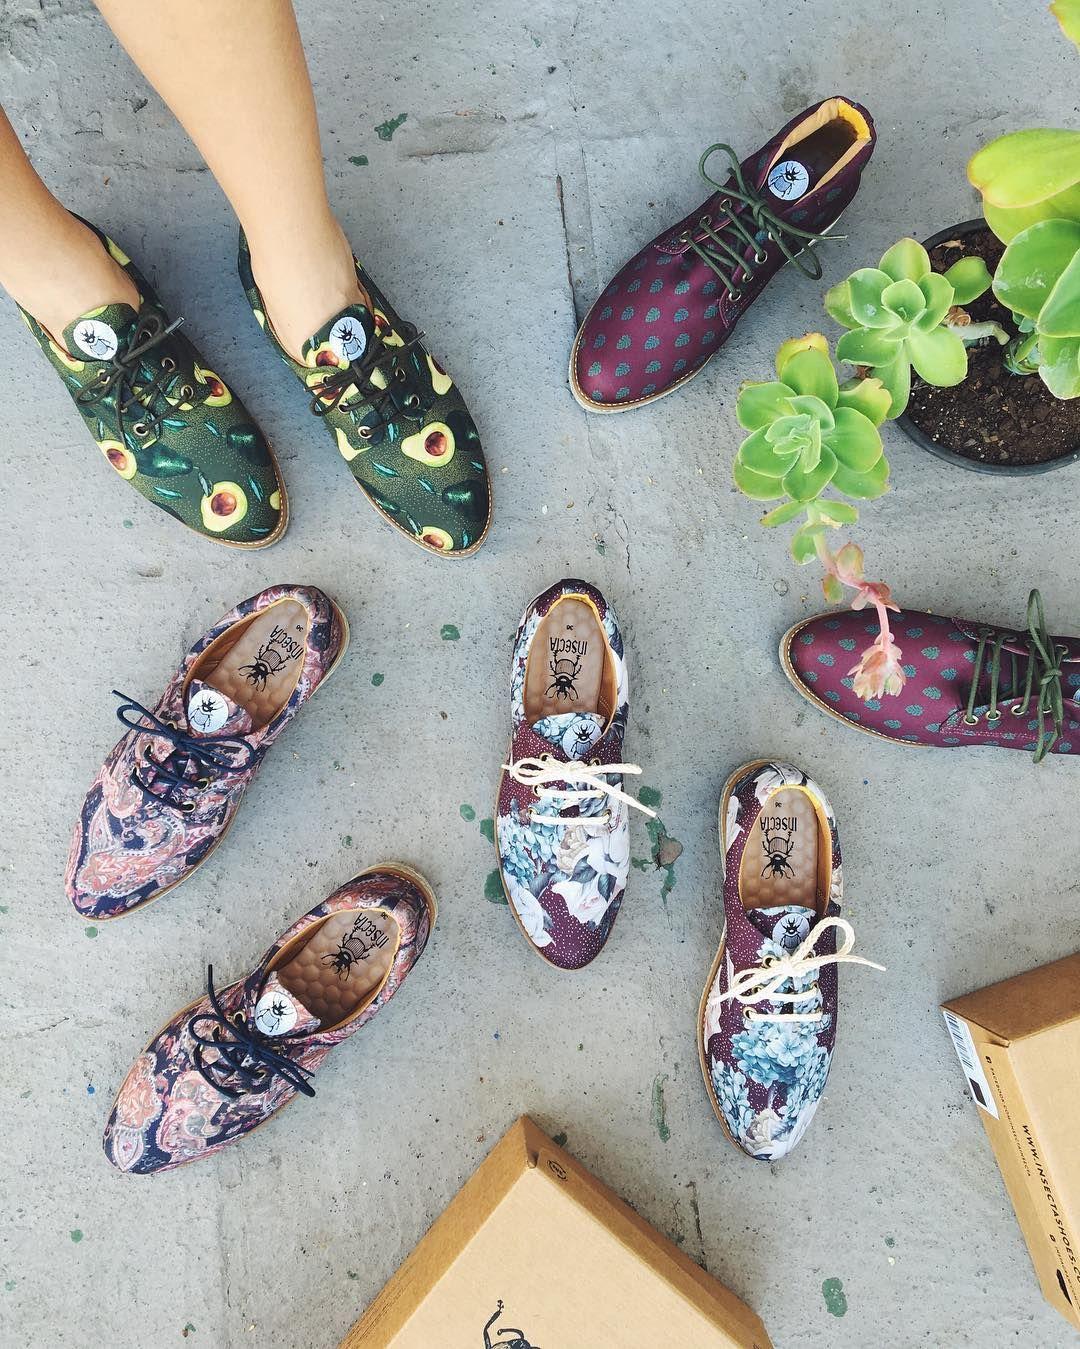 Jason Momoa Launches Sustainable Vegan Sneakers |